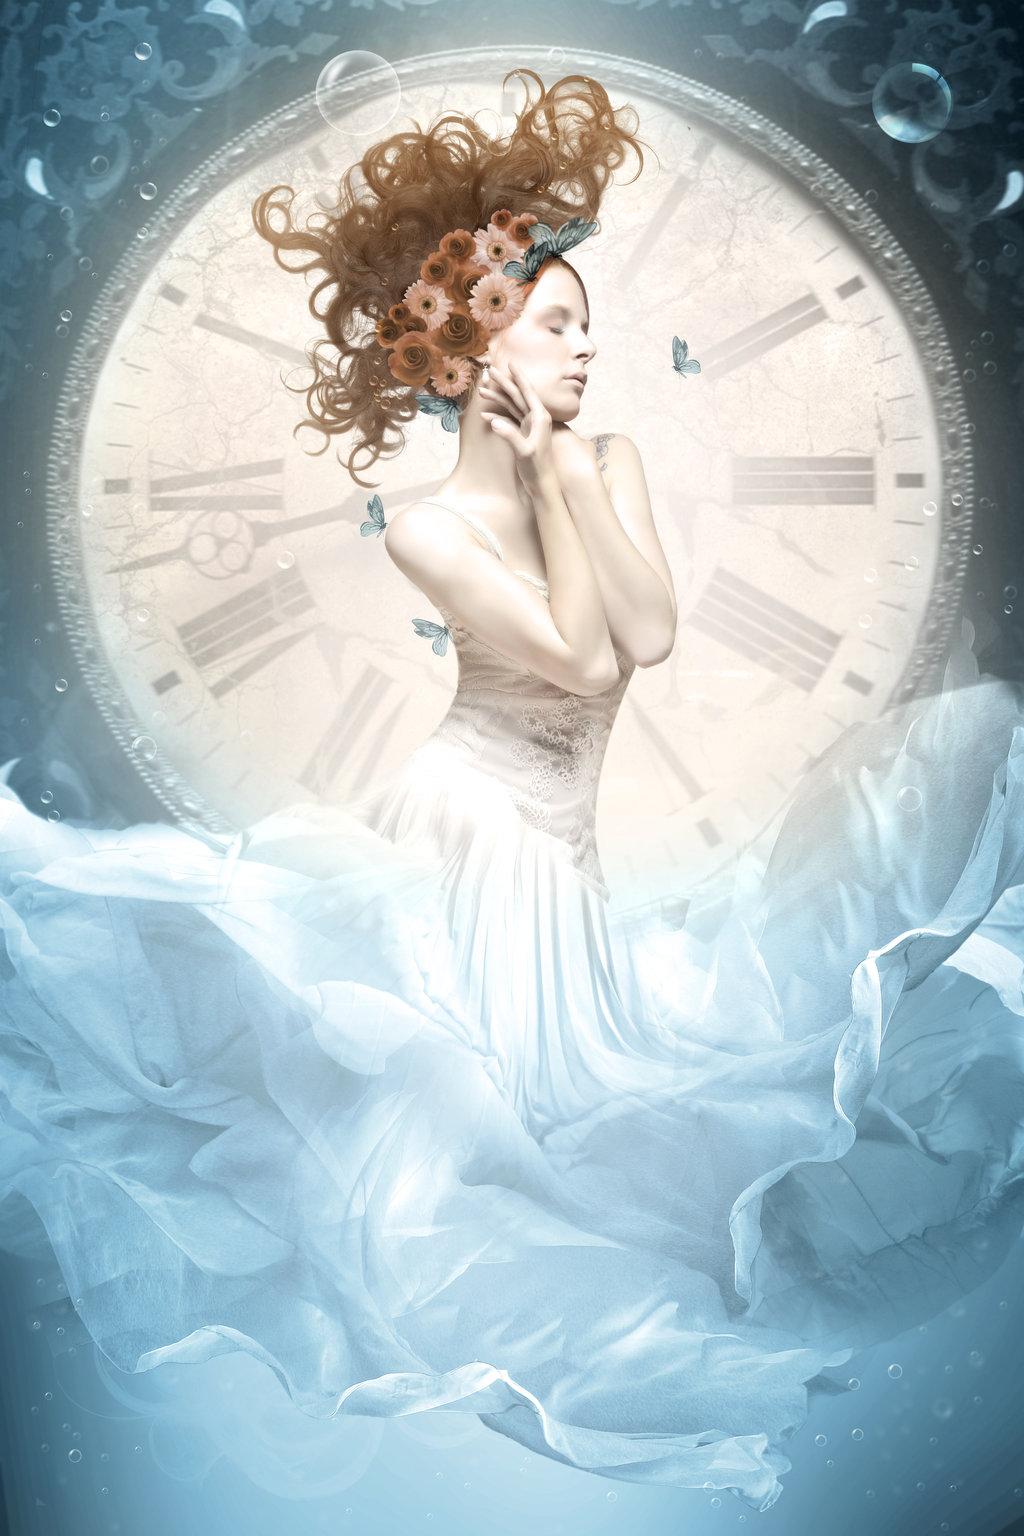 Clomid For Women Clomid For Men Goddess Of Time Erika